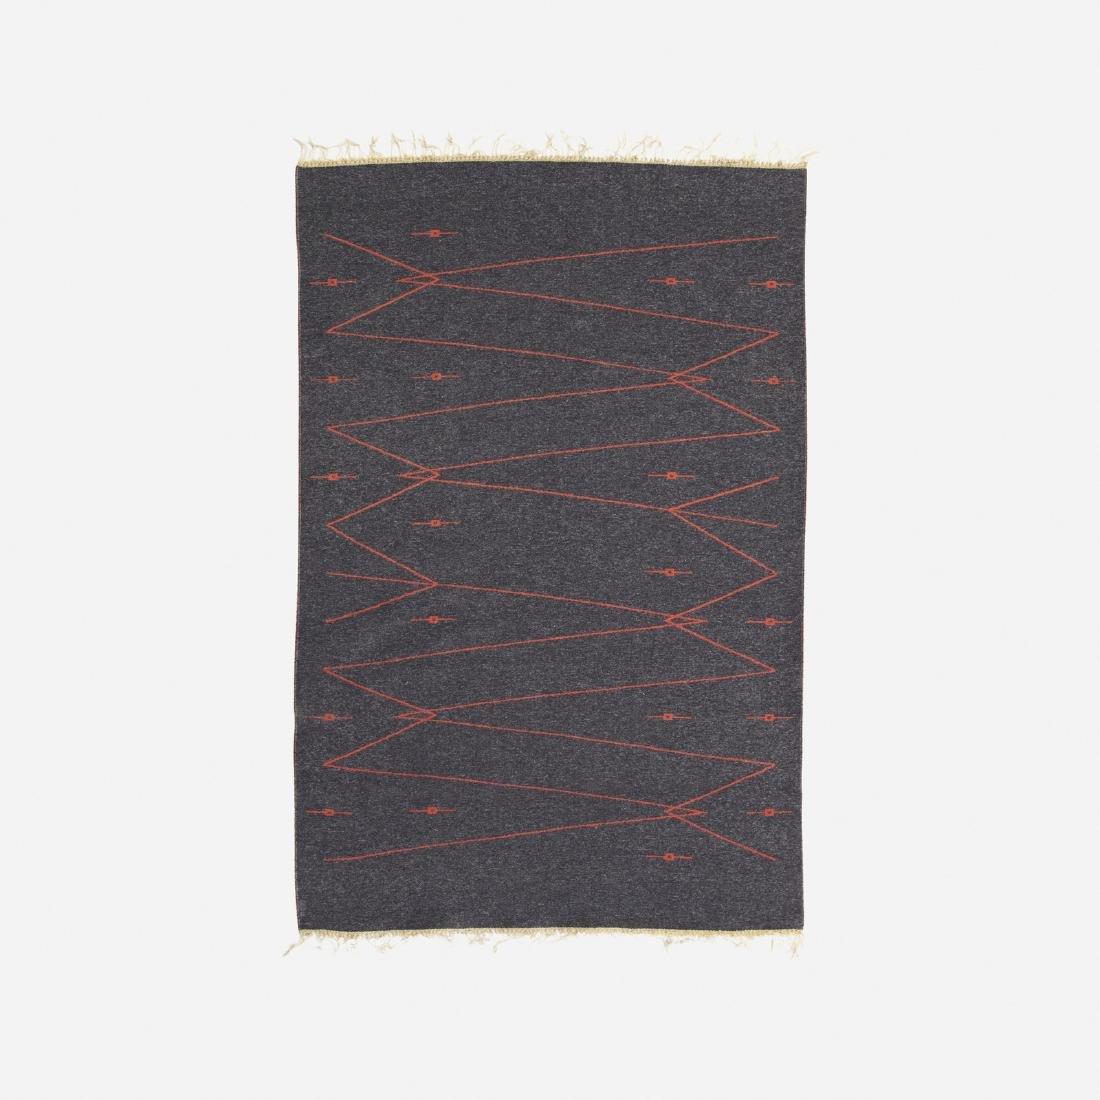 Aappo Harkonen, reversible flatweave carpet